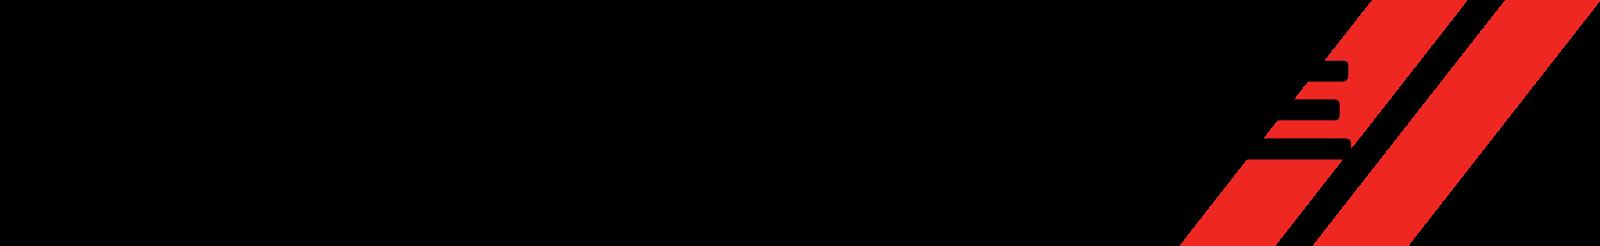 dodge logo 2 - Dodge Logo